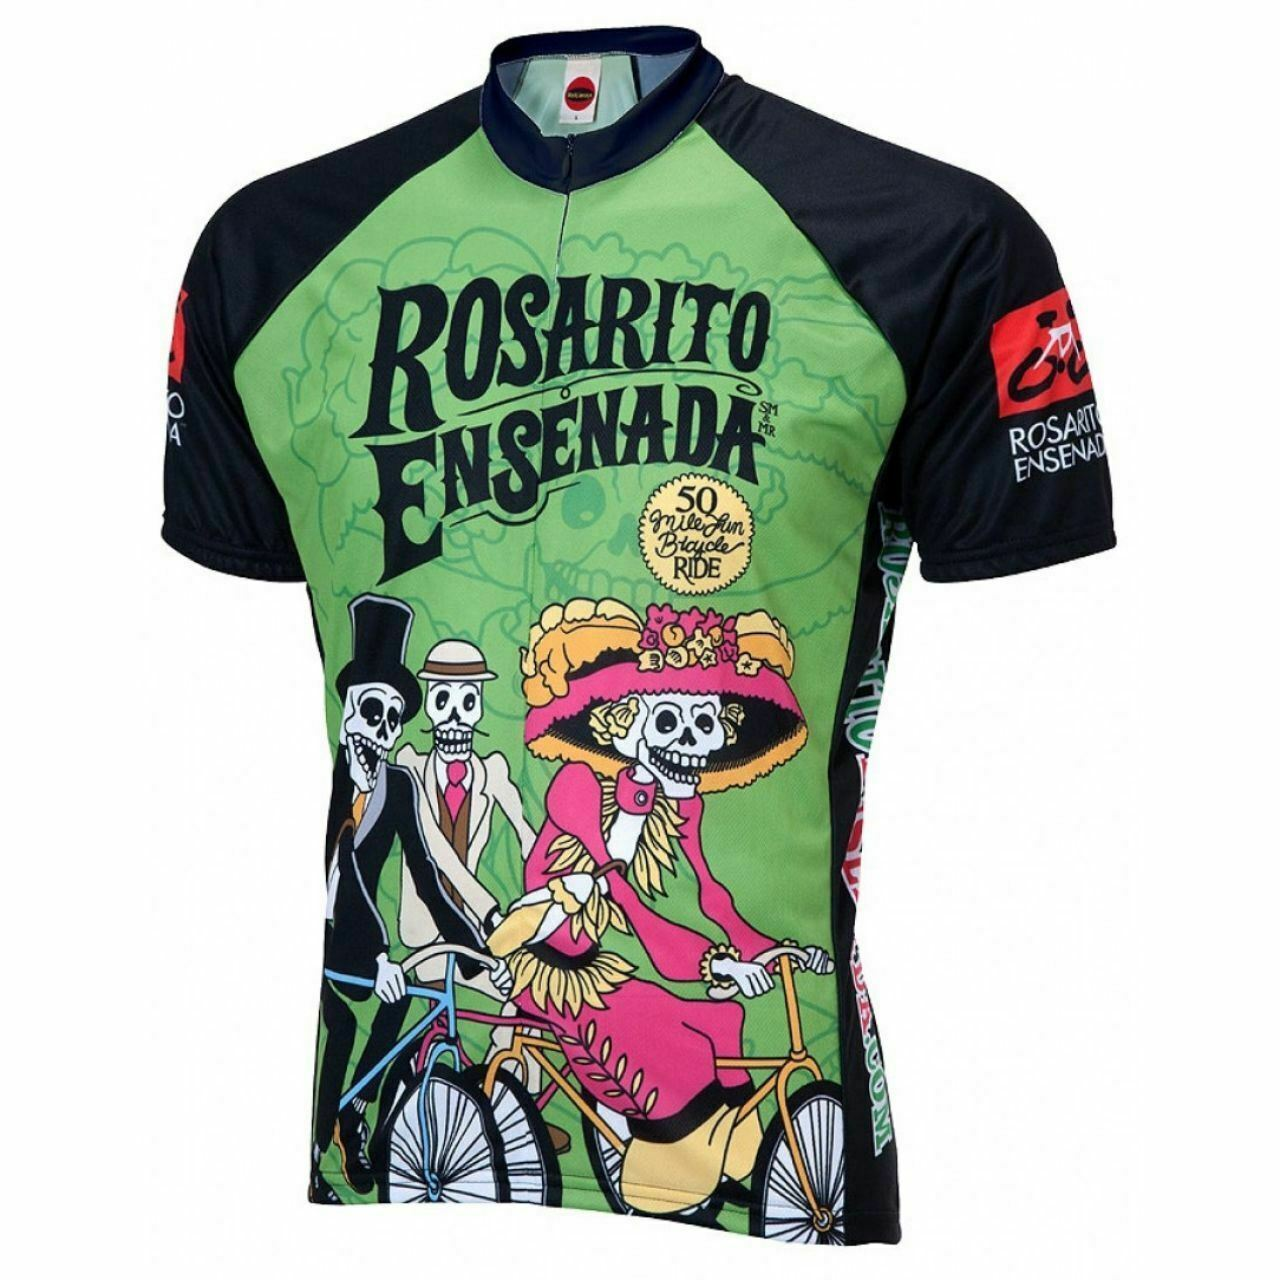 pinkrito Ensenada Day of  the Dead Short Sleeve 19  Zip  Men's Cycling Jersey  luxury brand